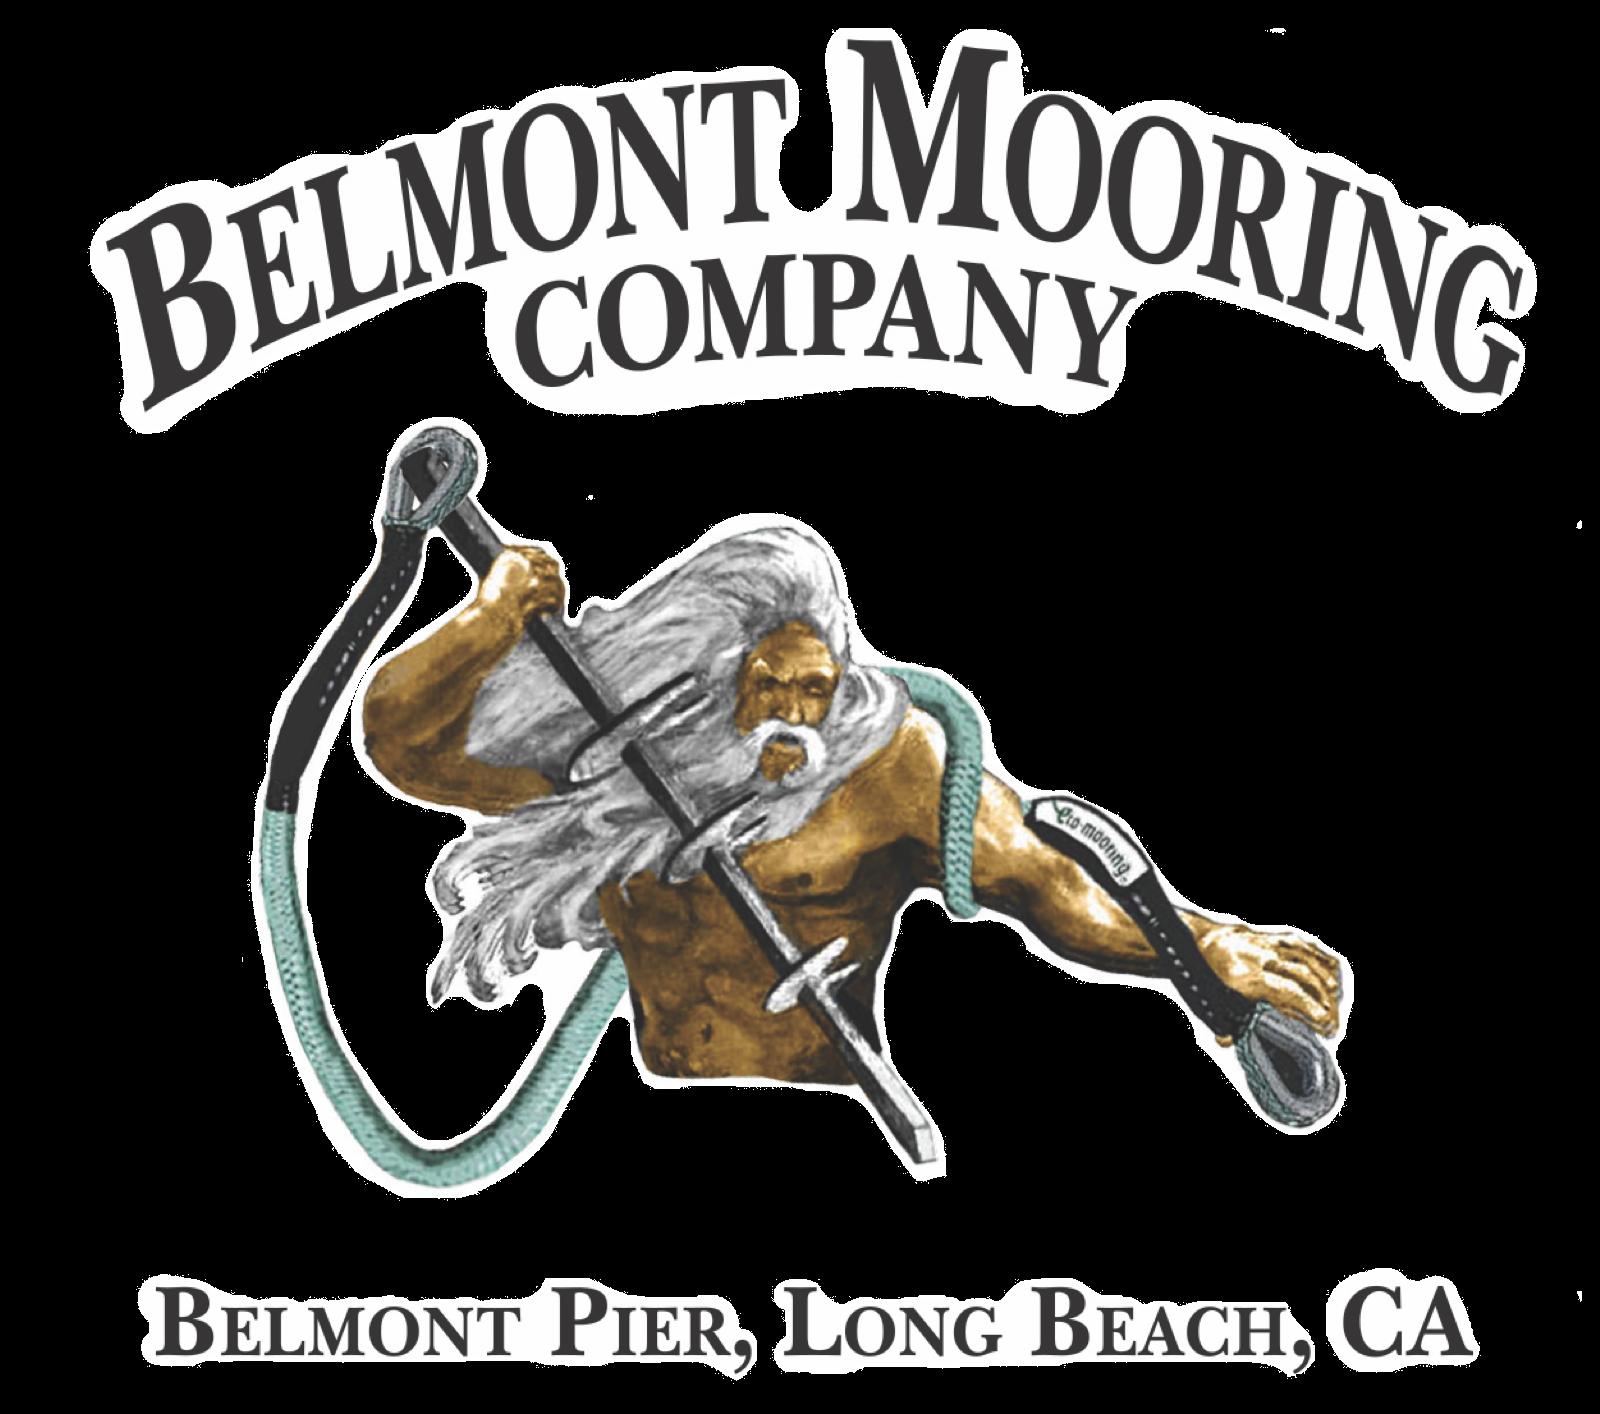 Belmont Moorings Company